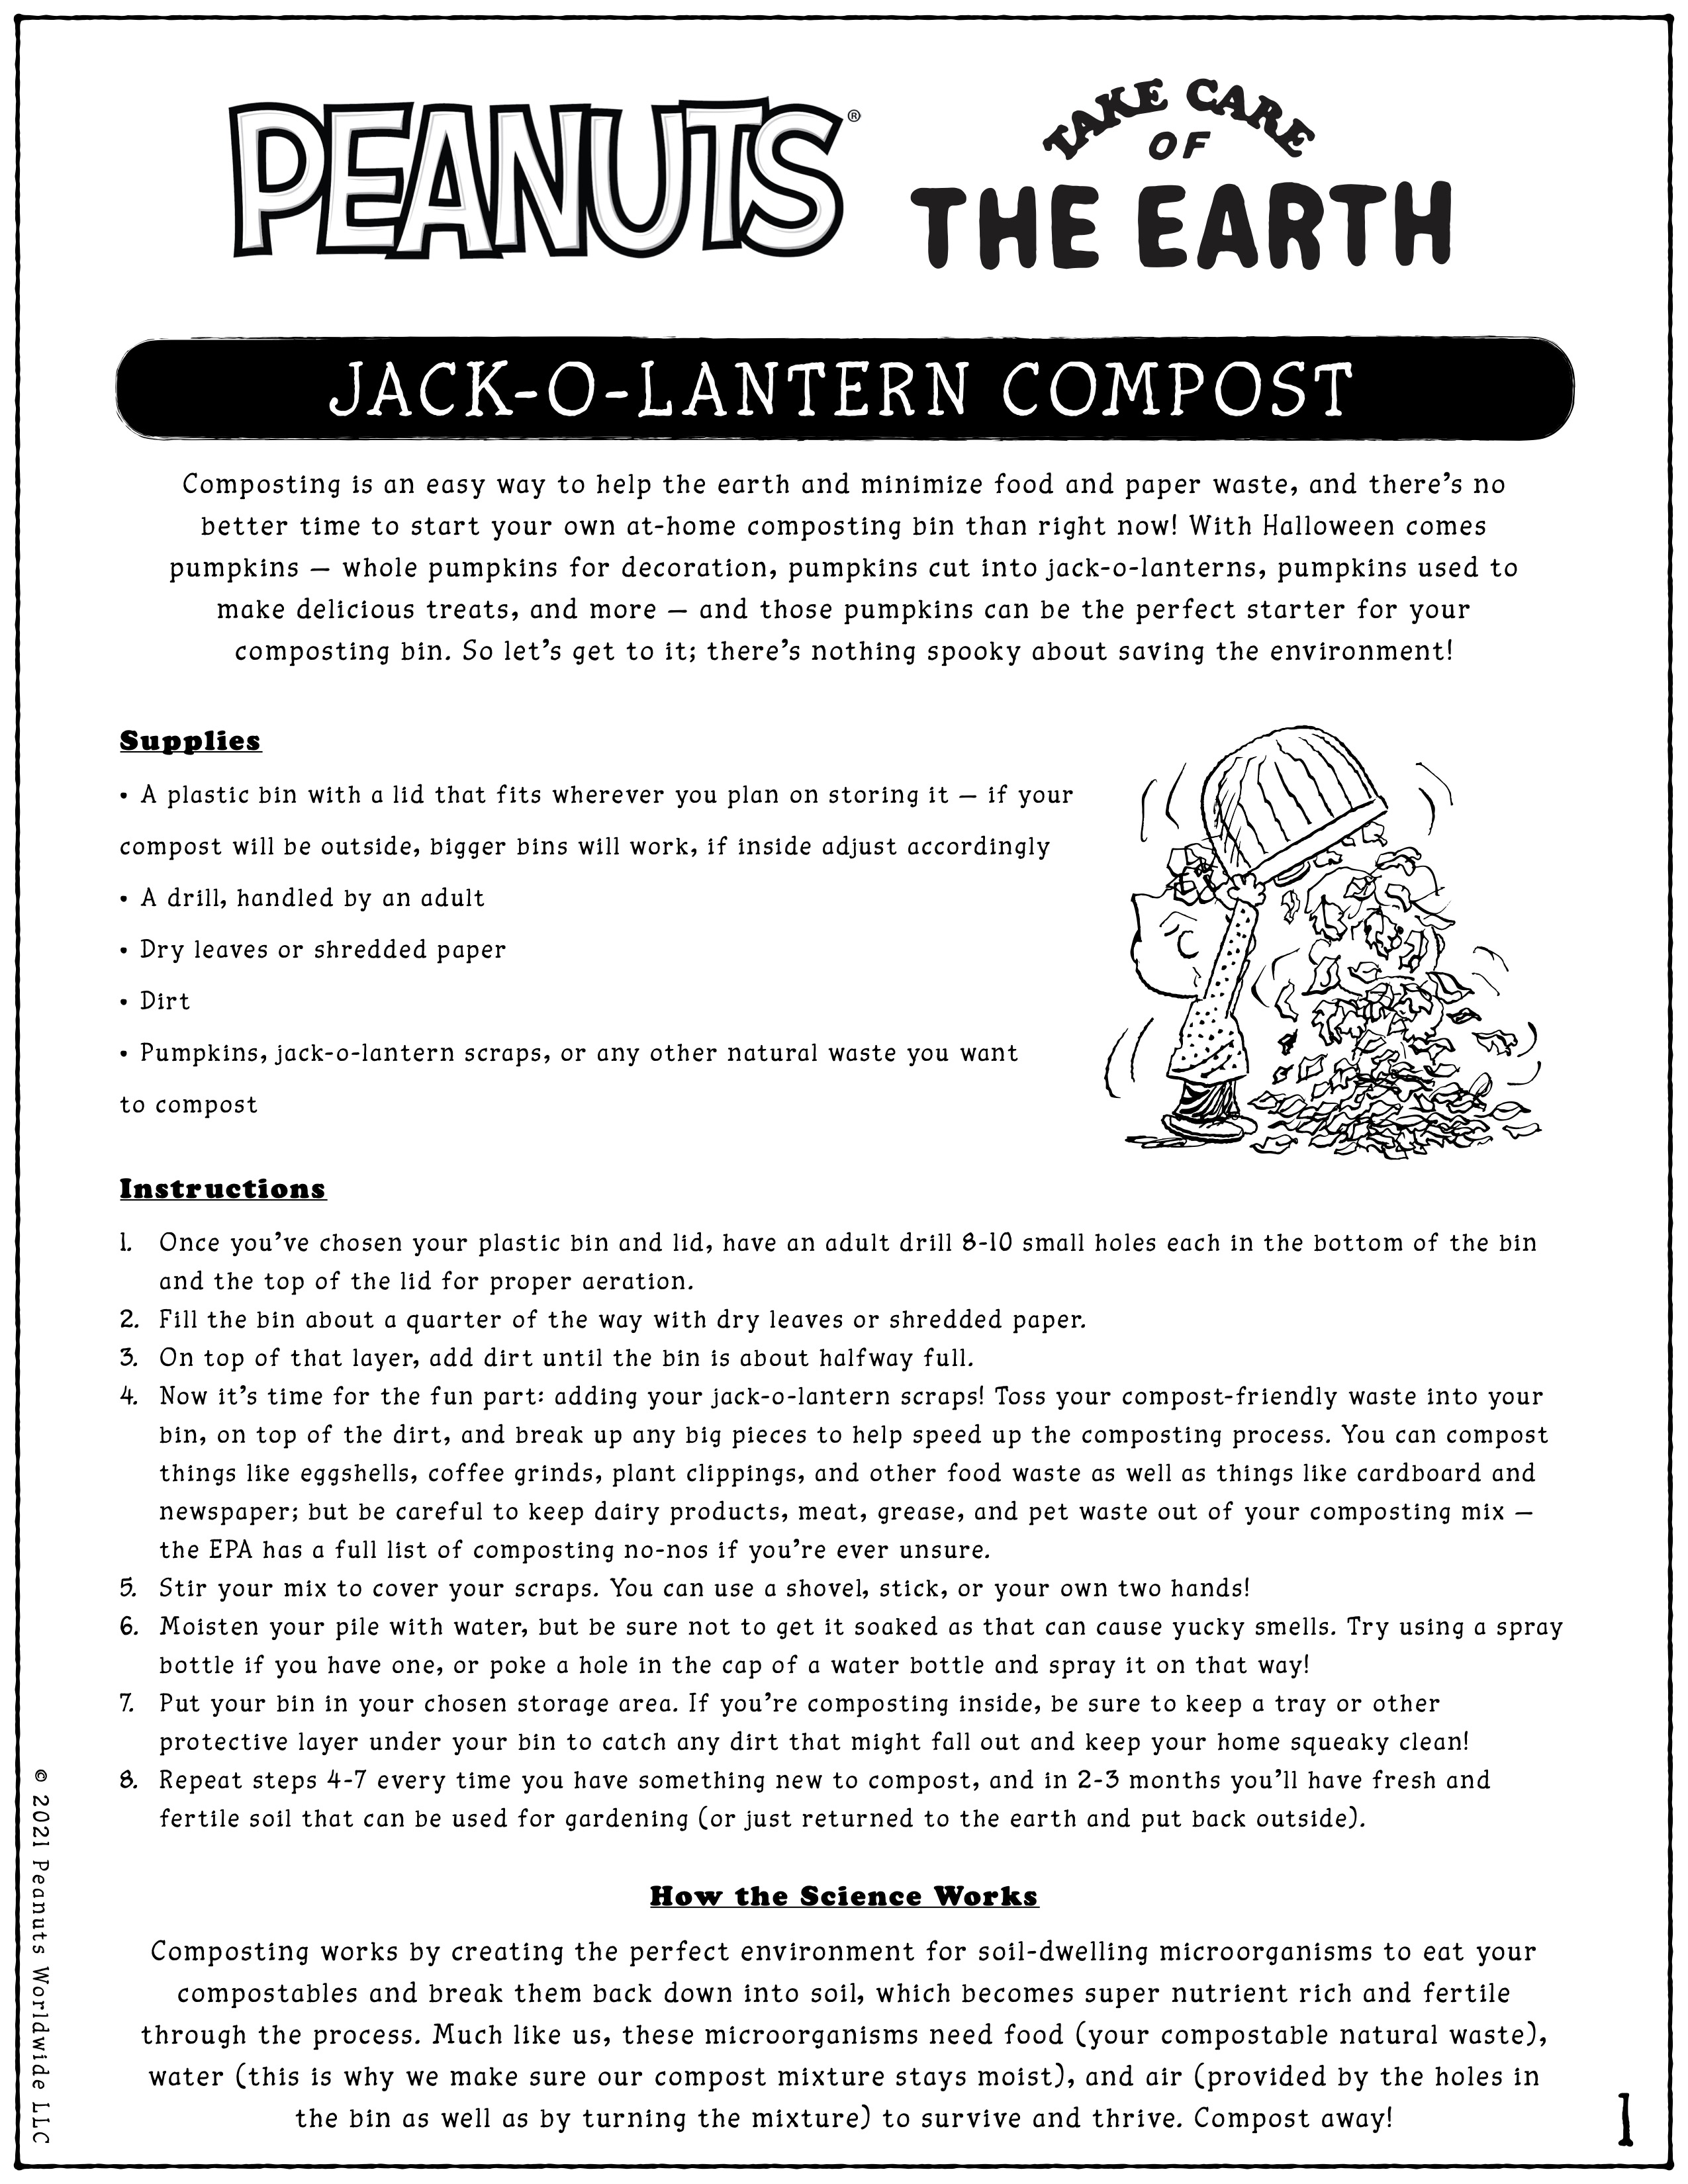 Jack-o-lantern compost activity sheet